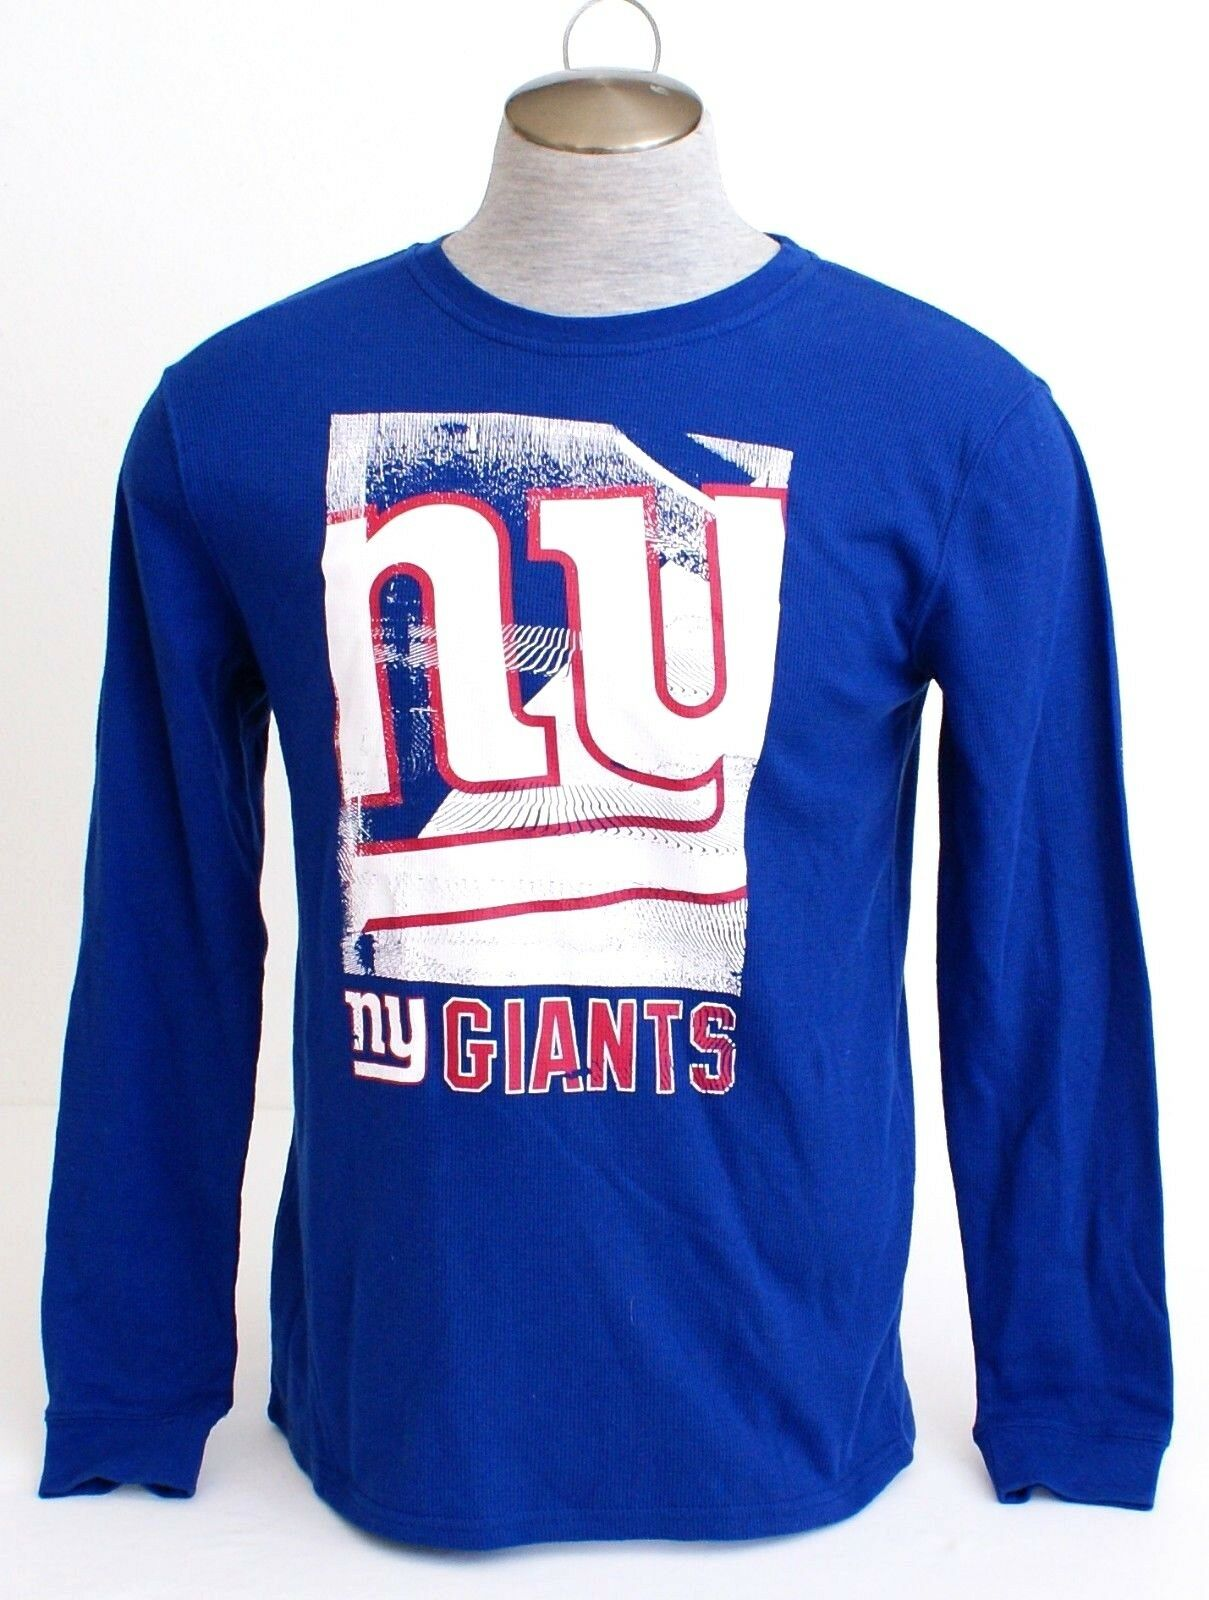 c95ac69d NFL Team Apparel NY Giants Sleeve Thermal Shirt Men's NWT bluee Long ...